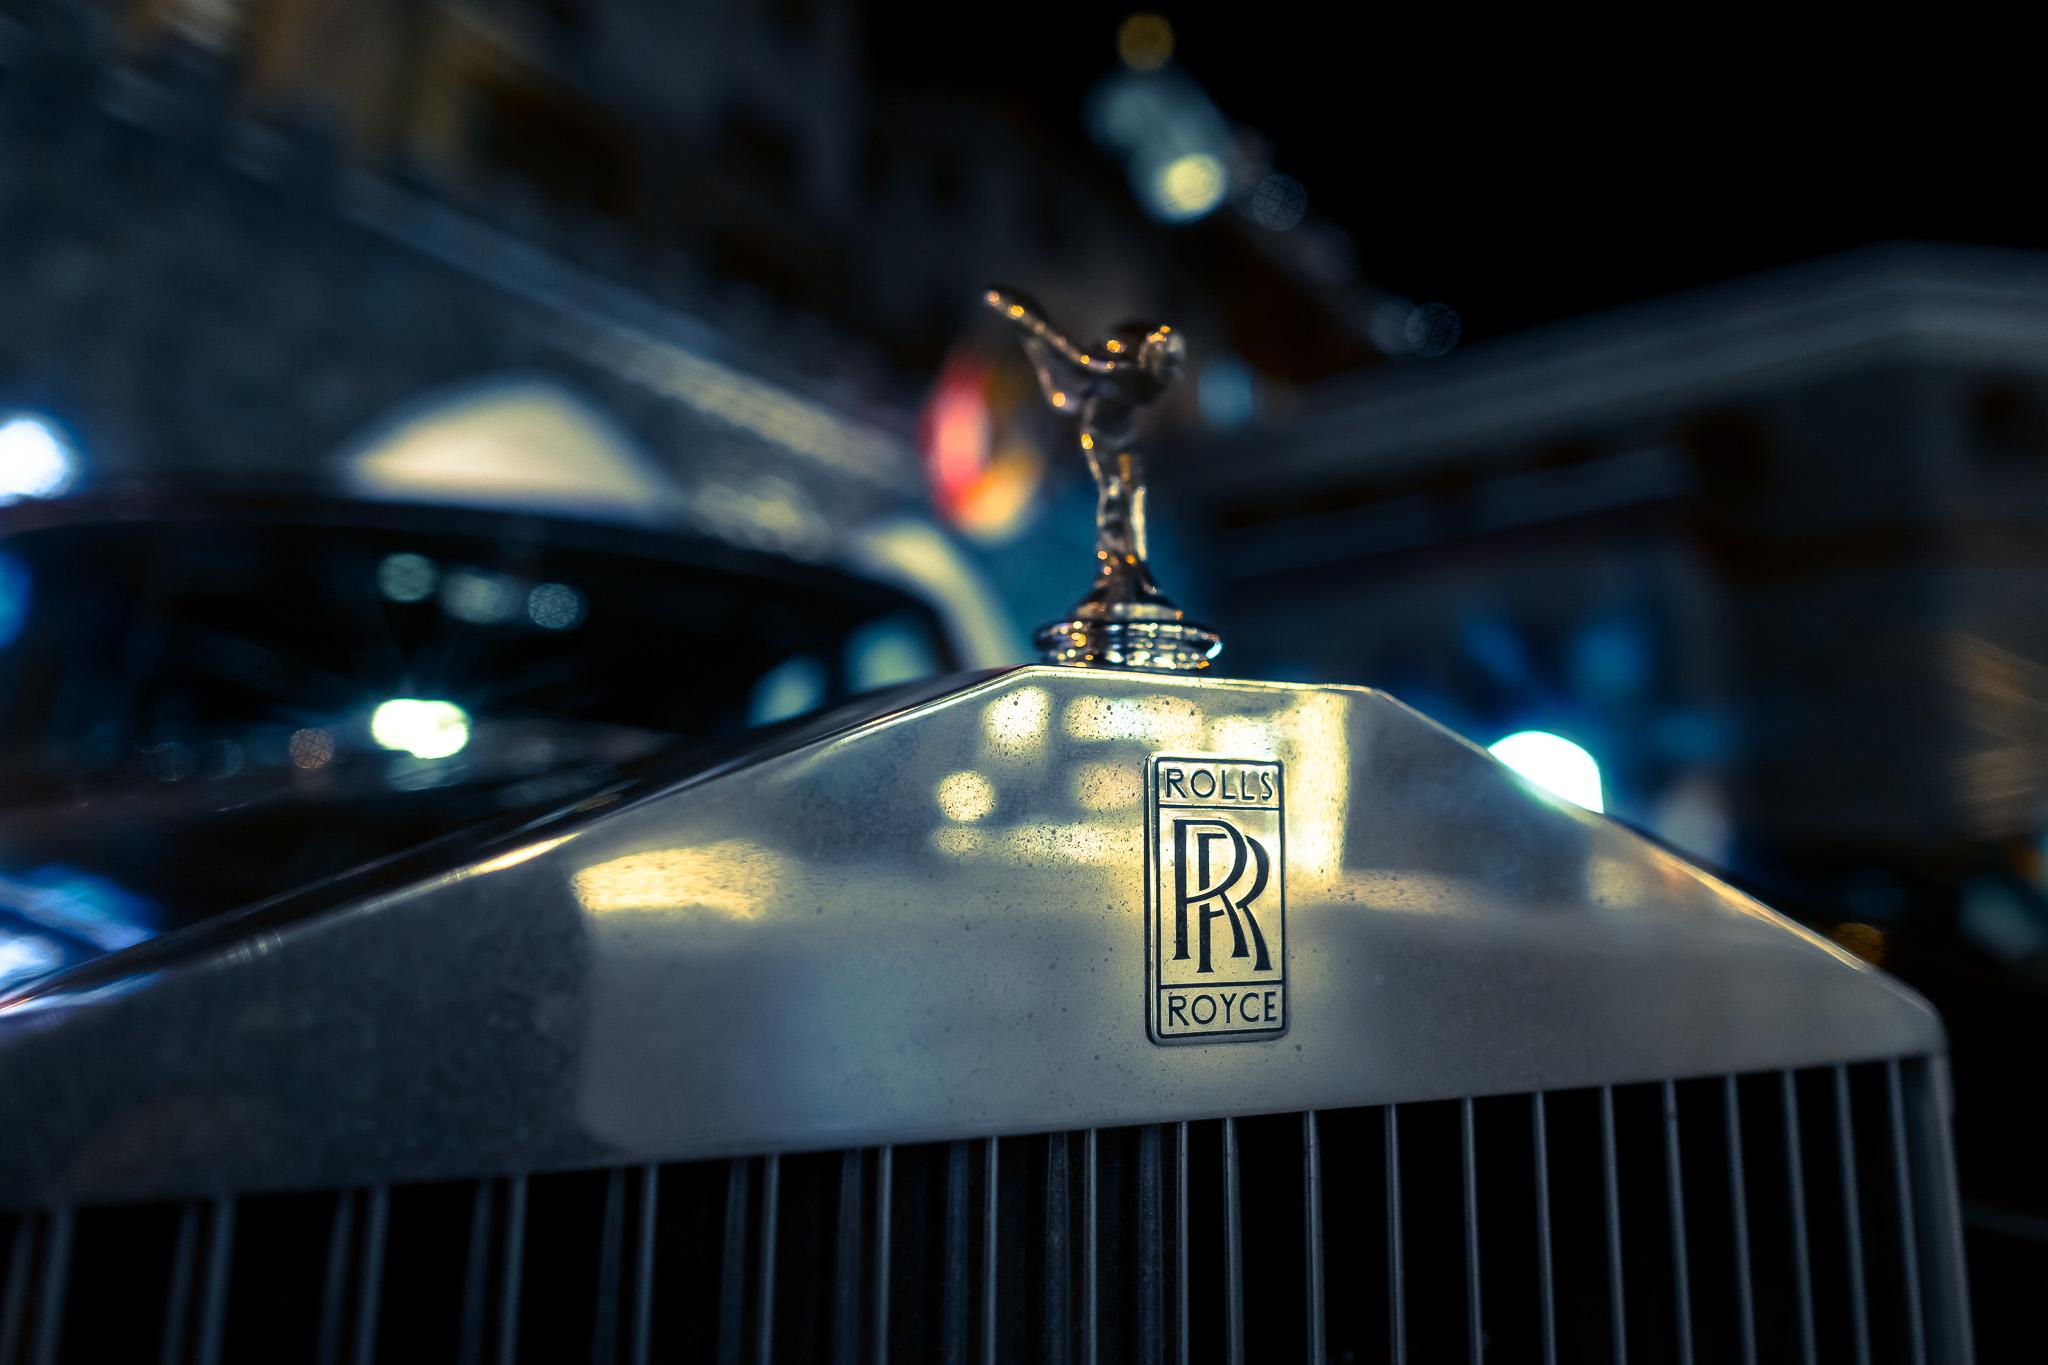 Rolls Royce St.Moritz